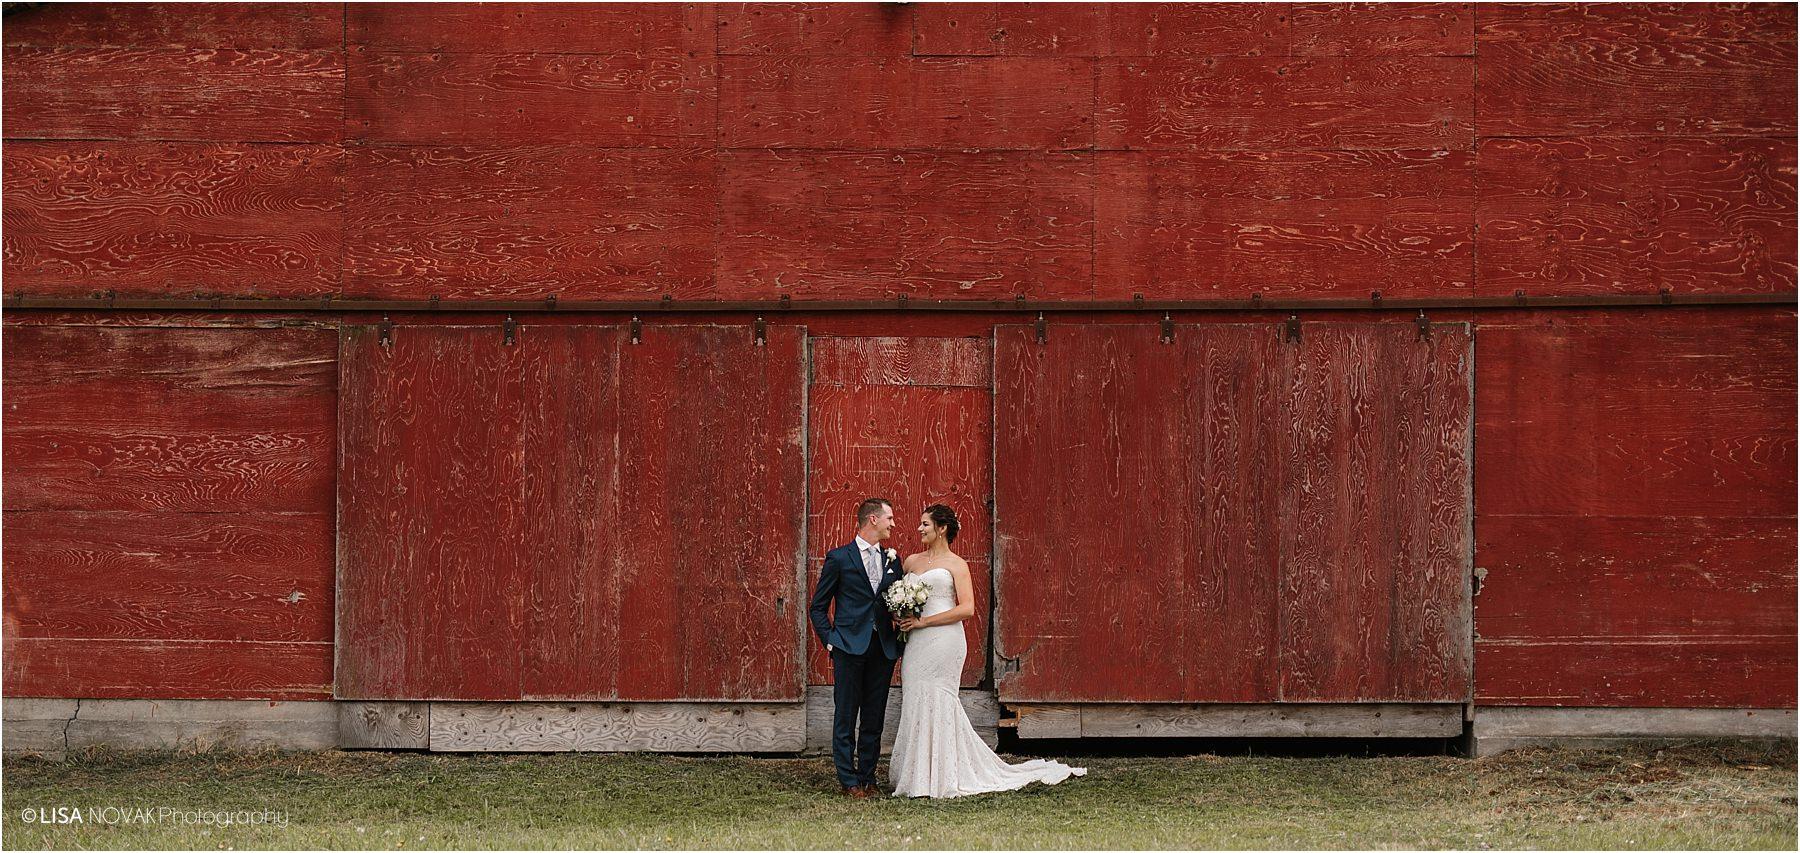 Kamloops wedding photographer Interior bride groom romantic epic mountain bridal portraits red barn